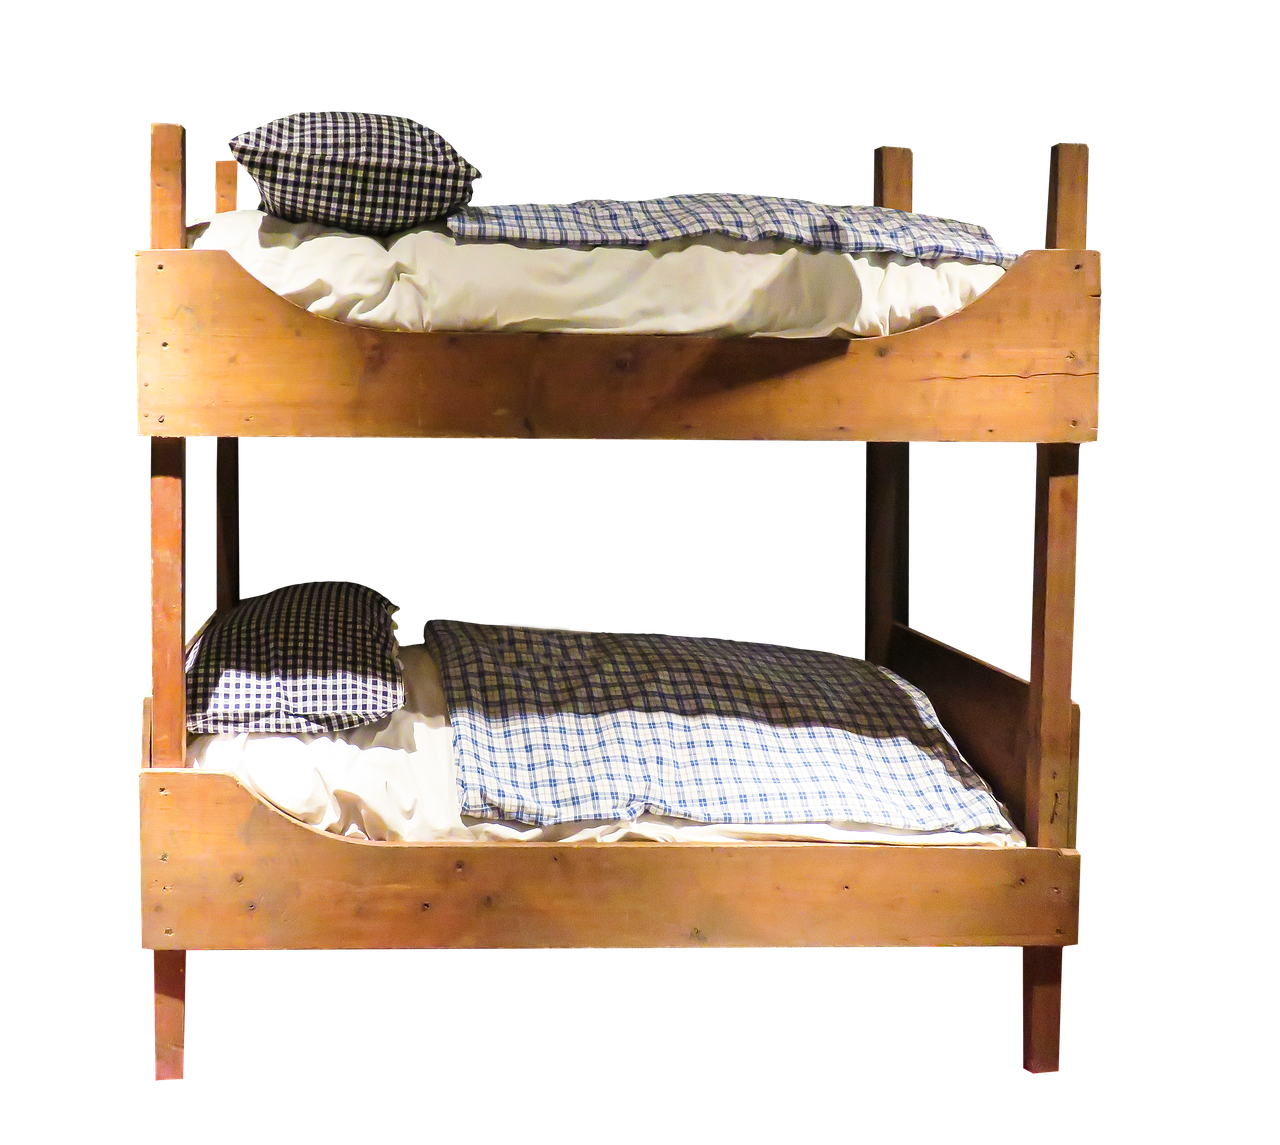 Les indémodables lits superposés